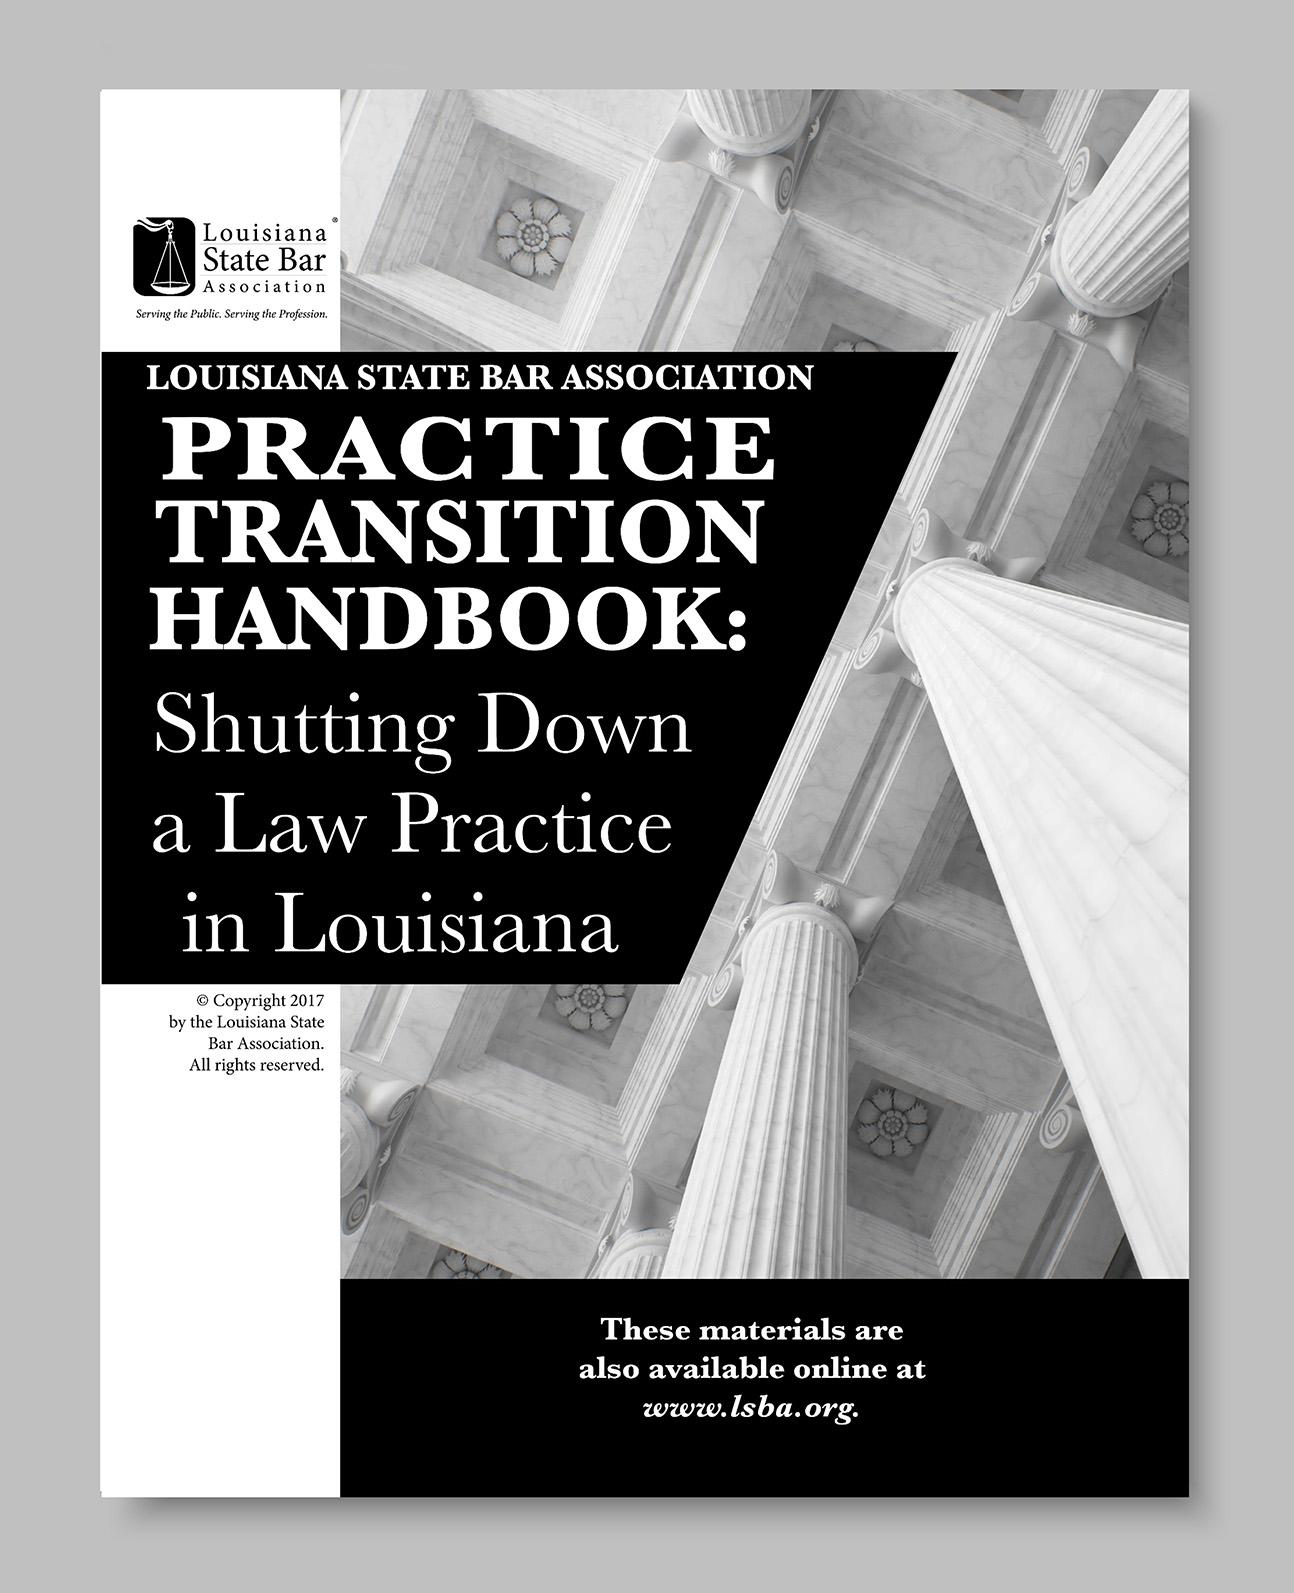 Practice Transition Handbook